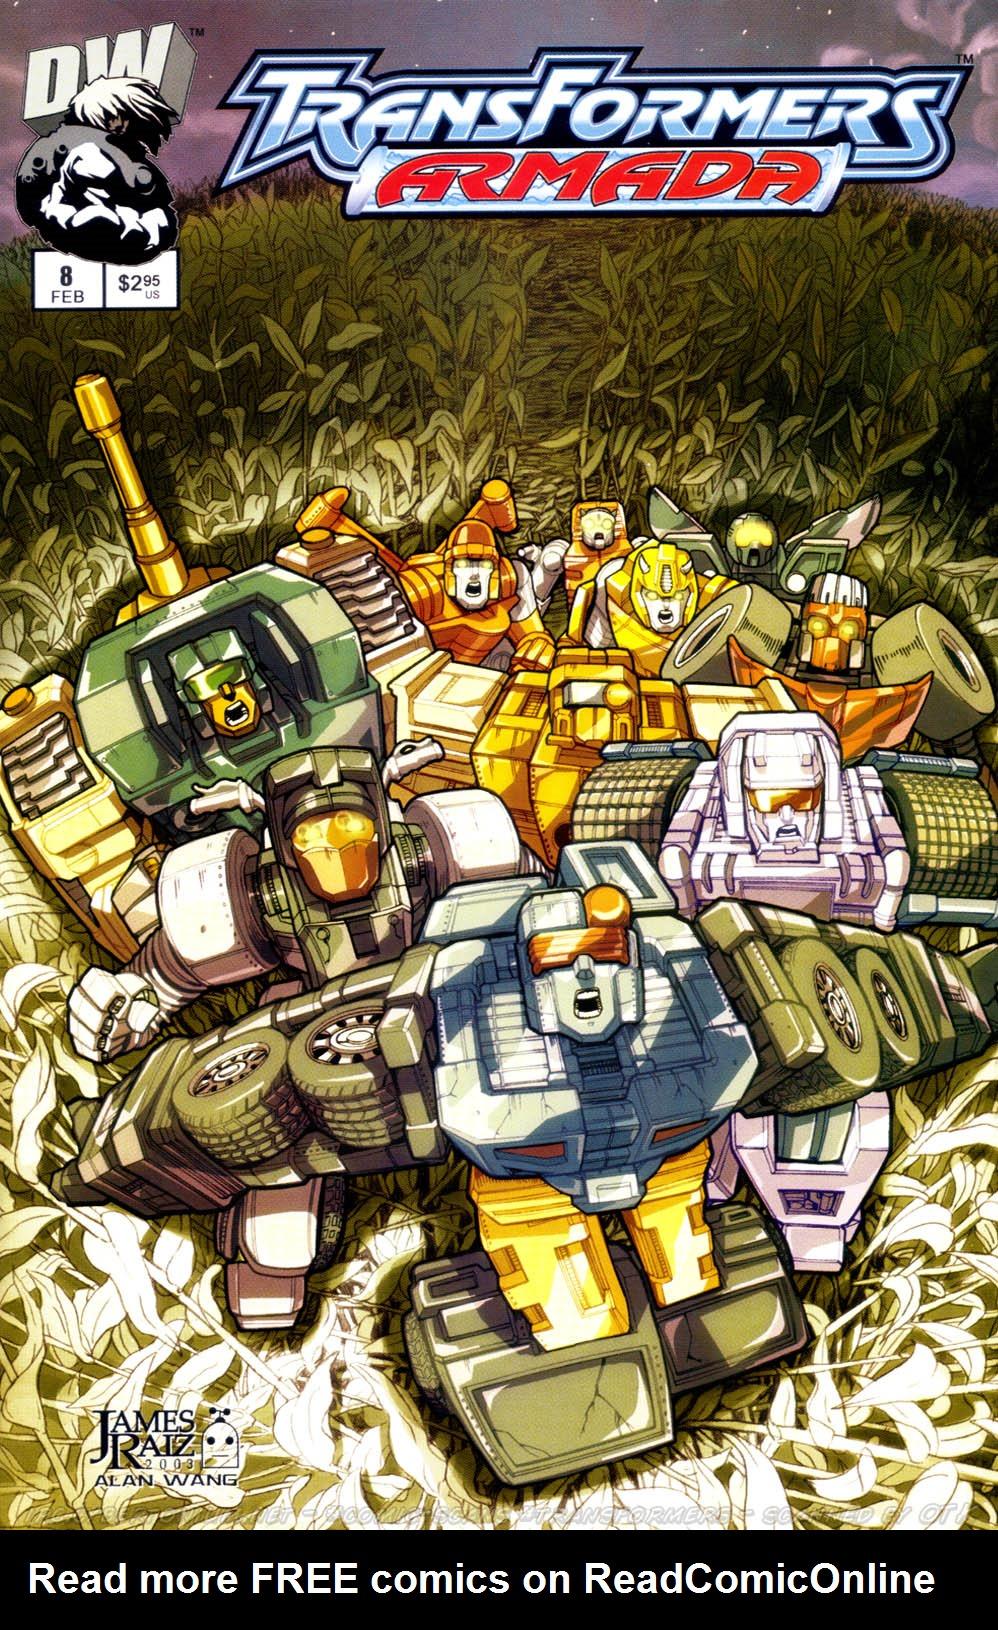 Read online Transformers Armada comic -  Issue #8 - 1